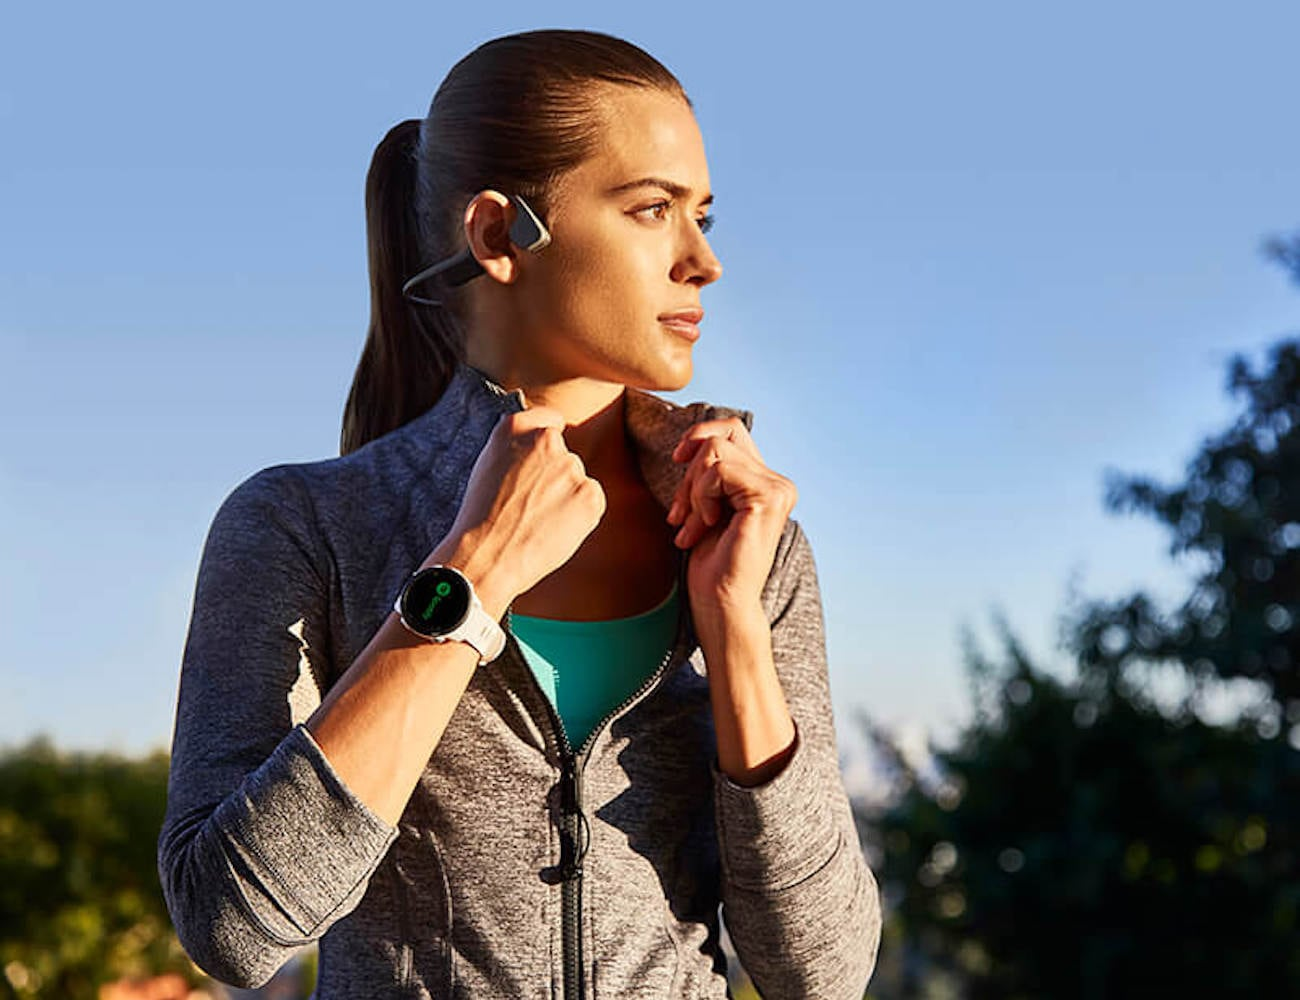 Garmin Forerunner 245 Music GPS Running Smart Watch holds up to 500 songs